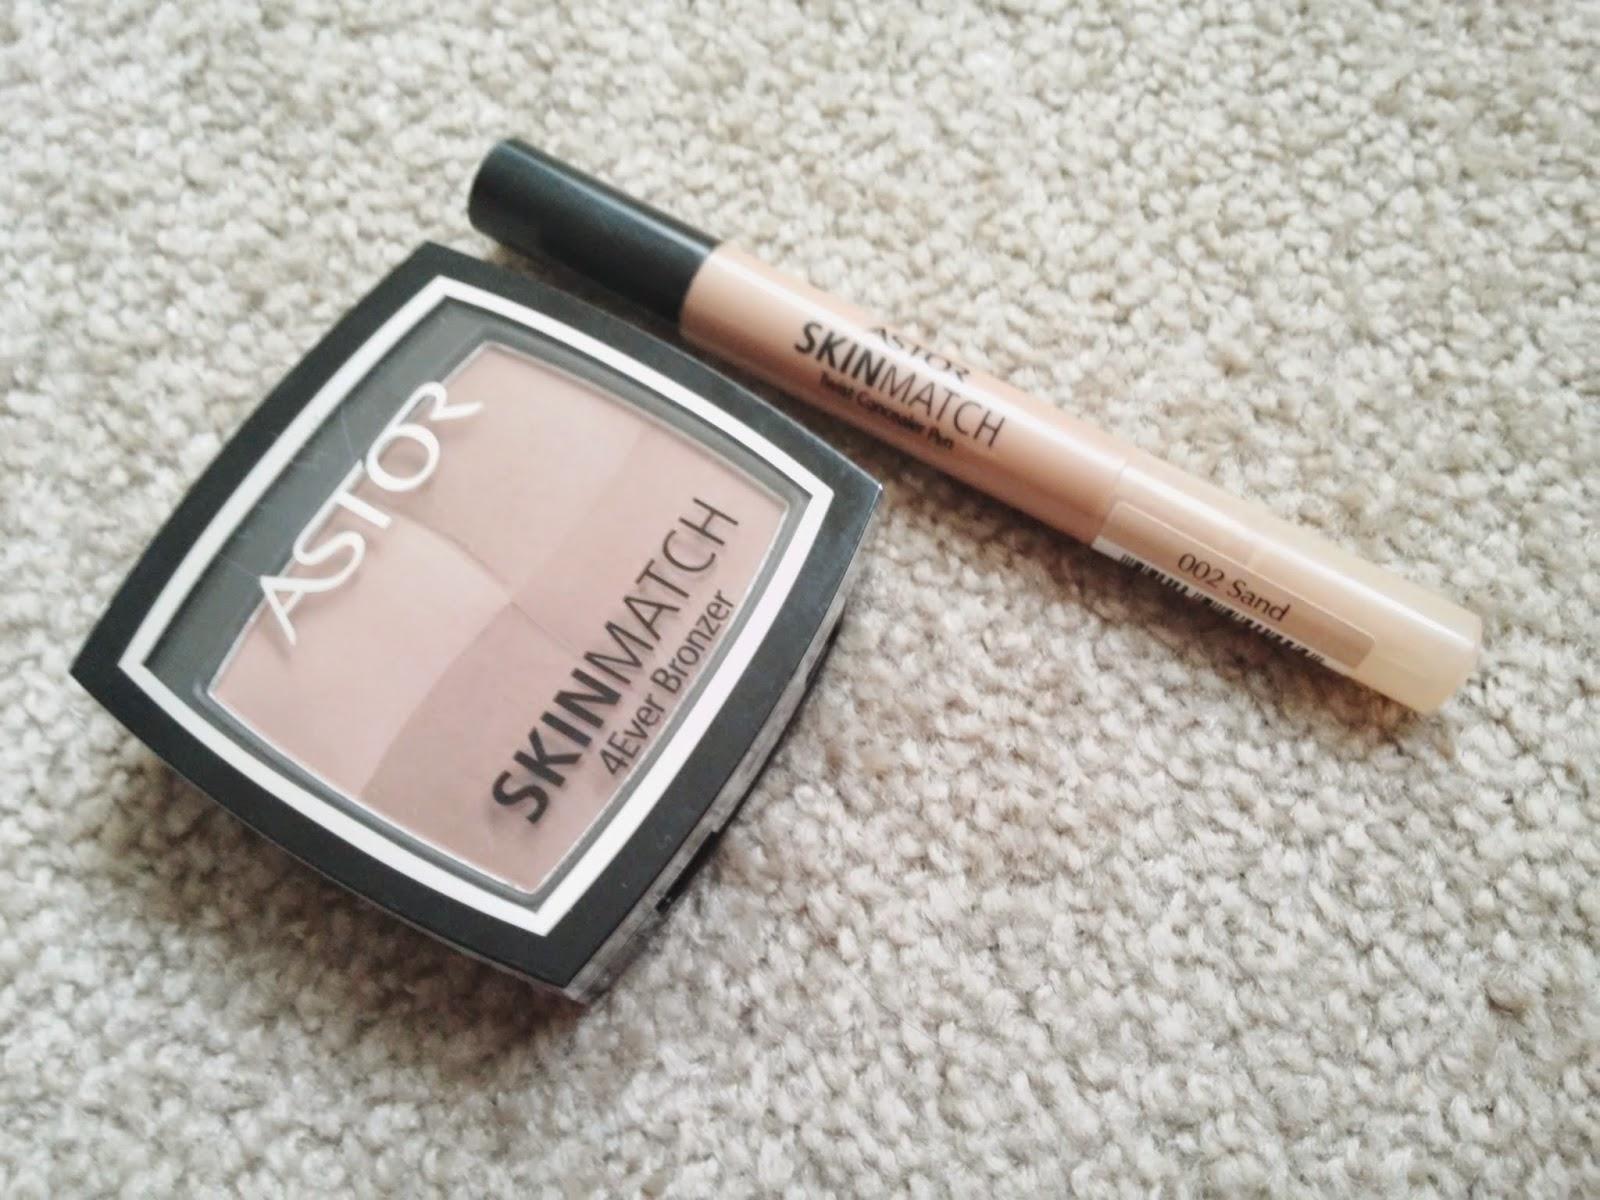 Rozświetlający korektor Astor: Skin Match Twist Concealer Pen